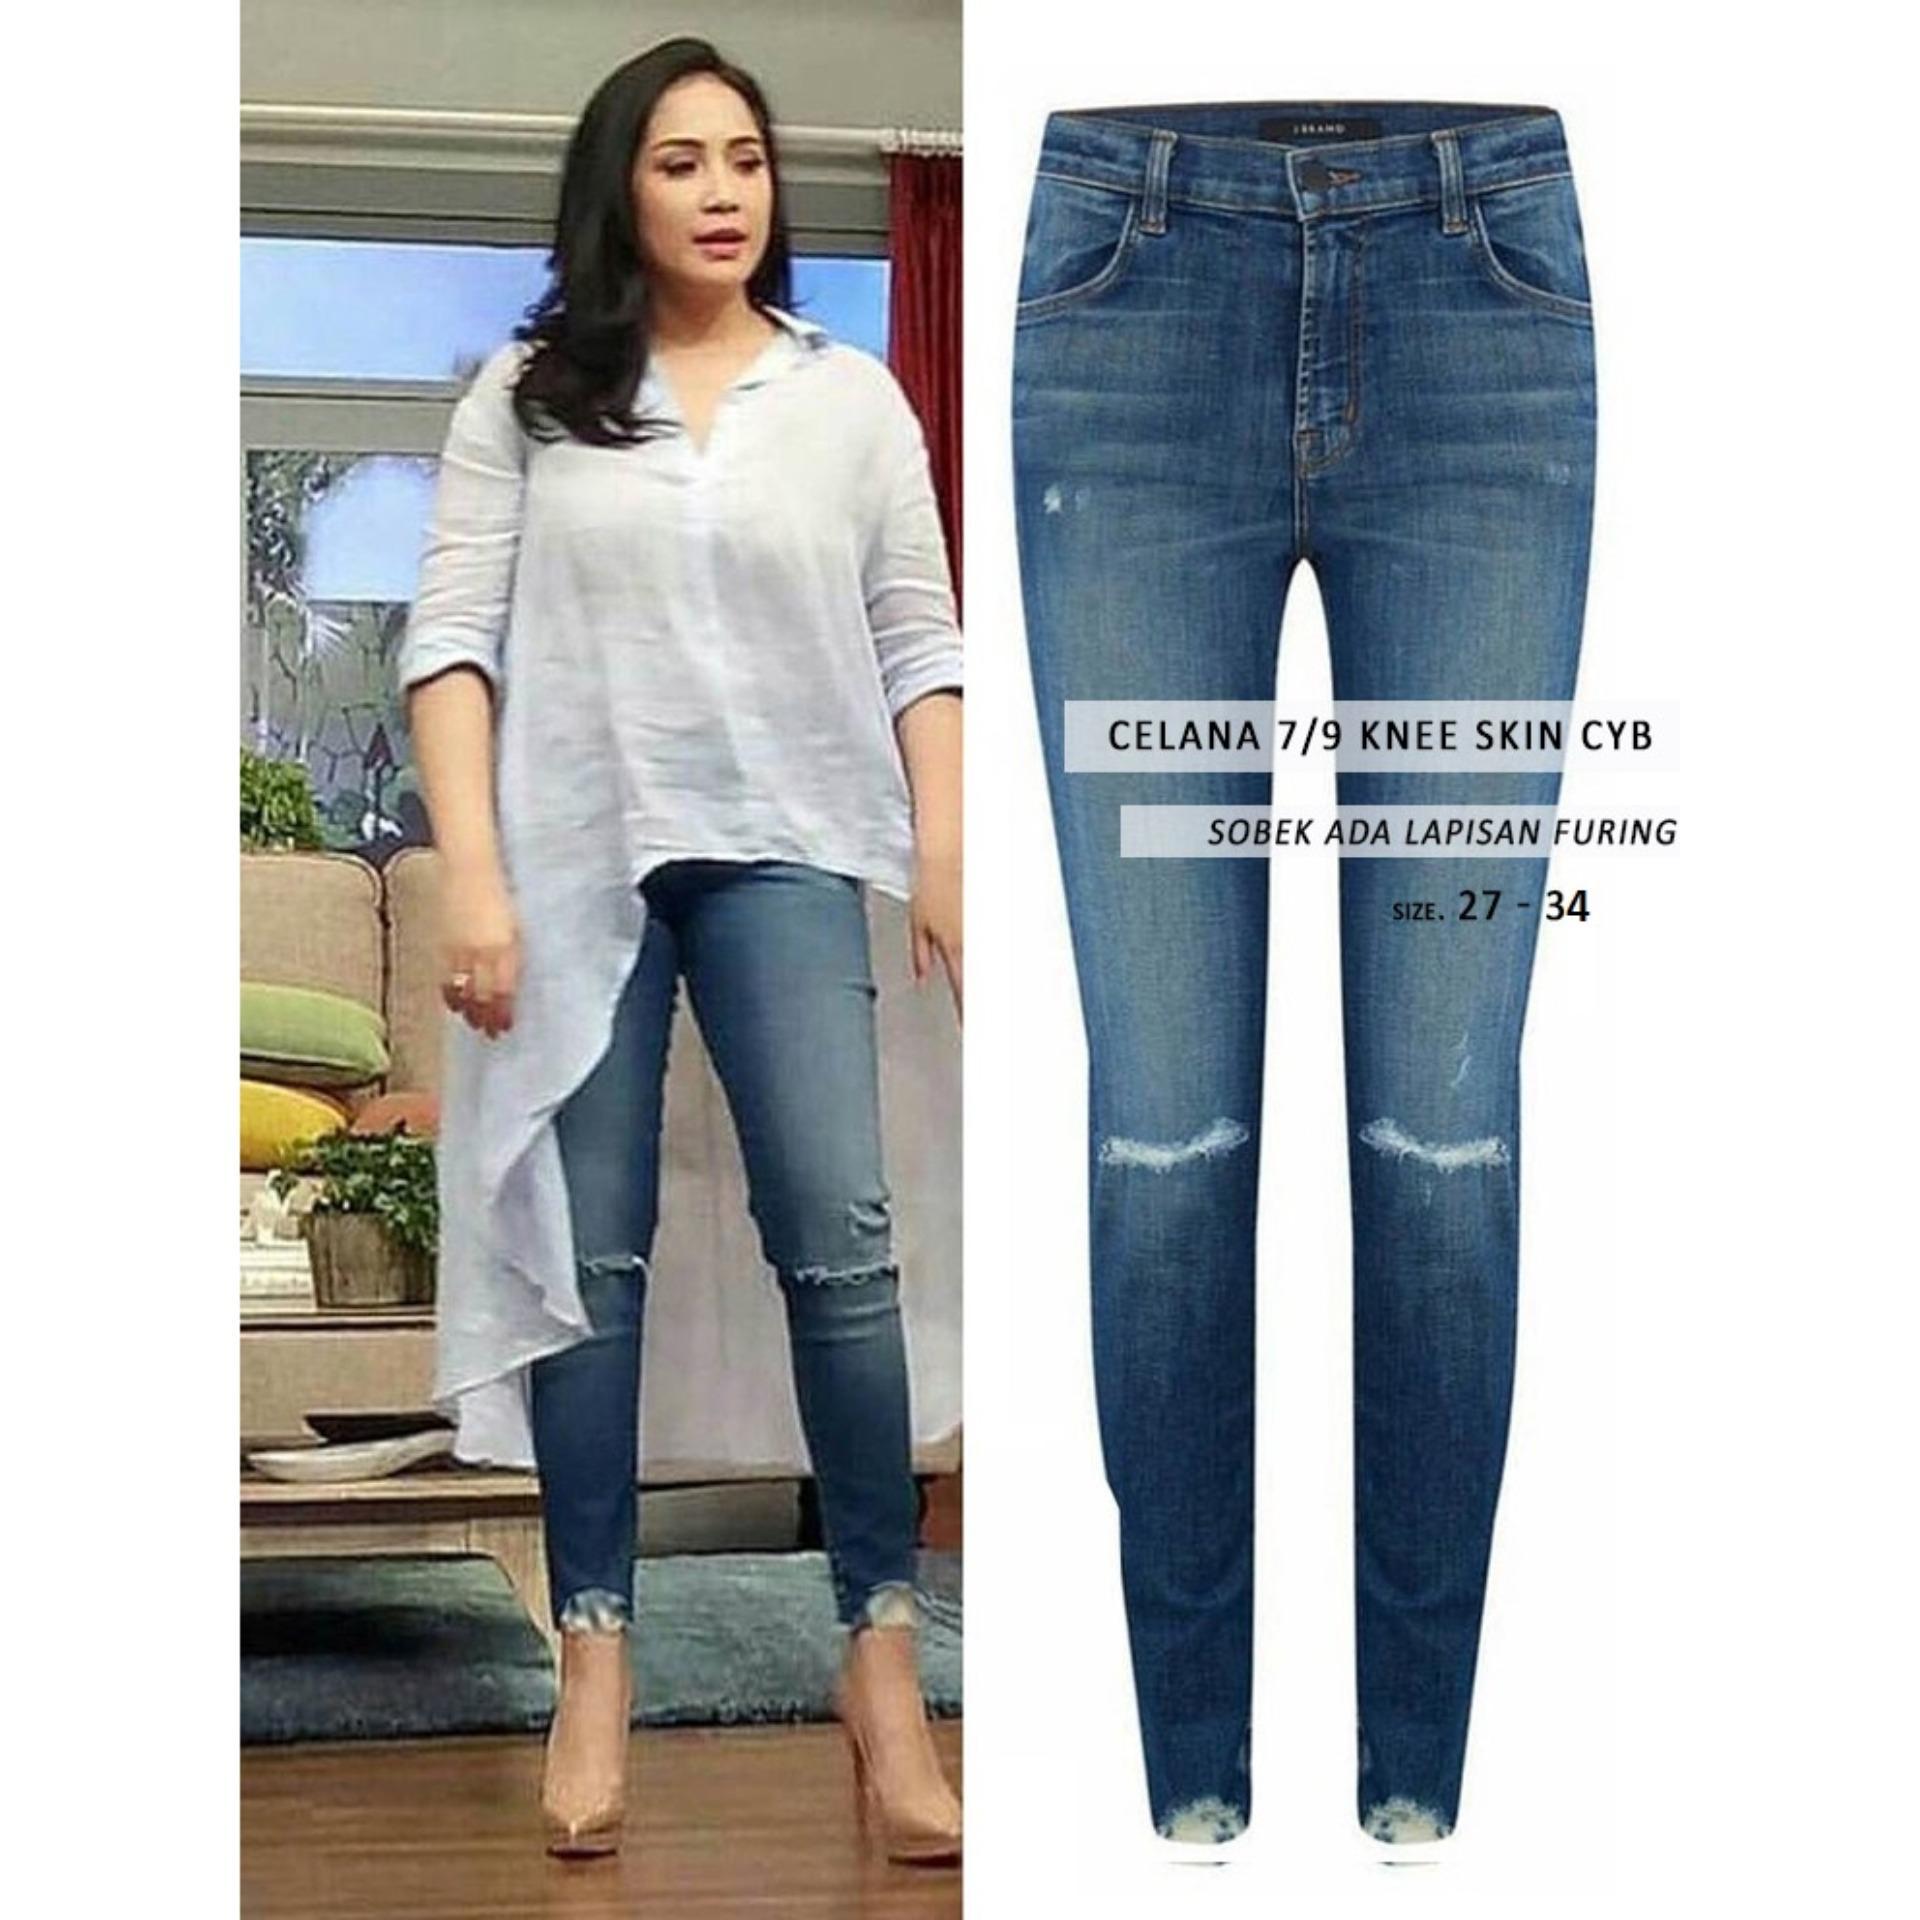 Celana Ripped Jeans - Celana Knee Skin CYB - New Arrival (Sobek Tidak Tembus Kulit